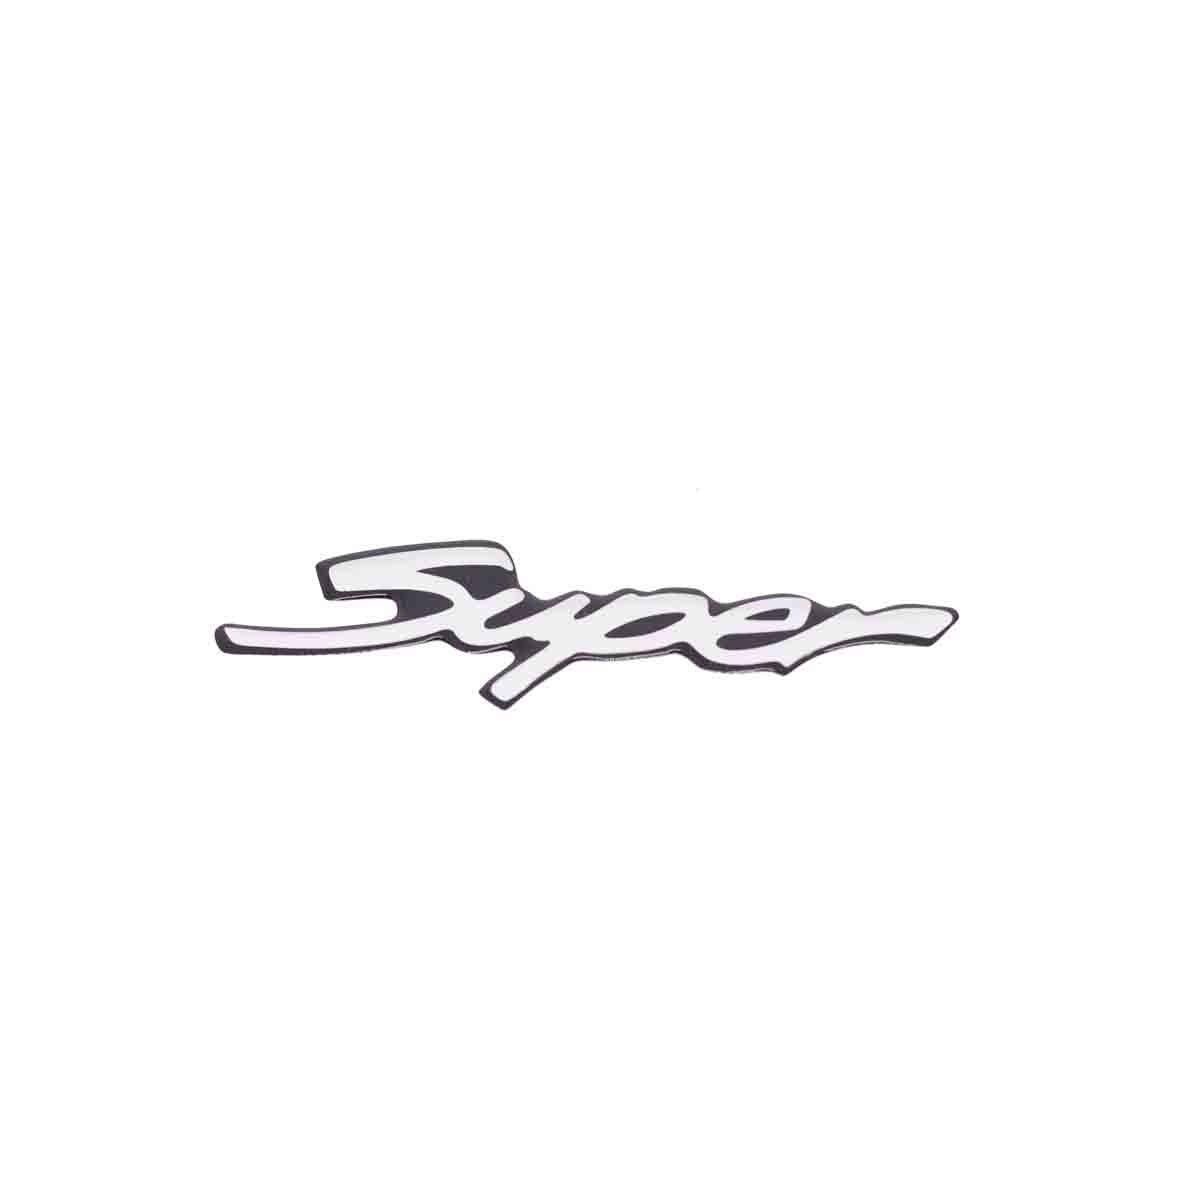 Emblema Super Corsa 97/98 GM Pequeno